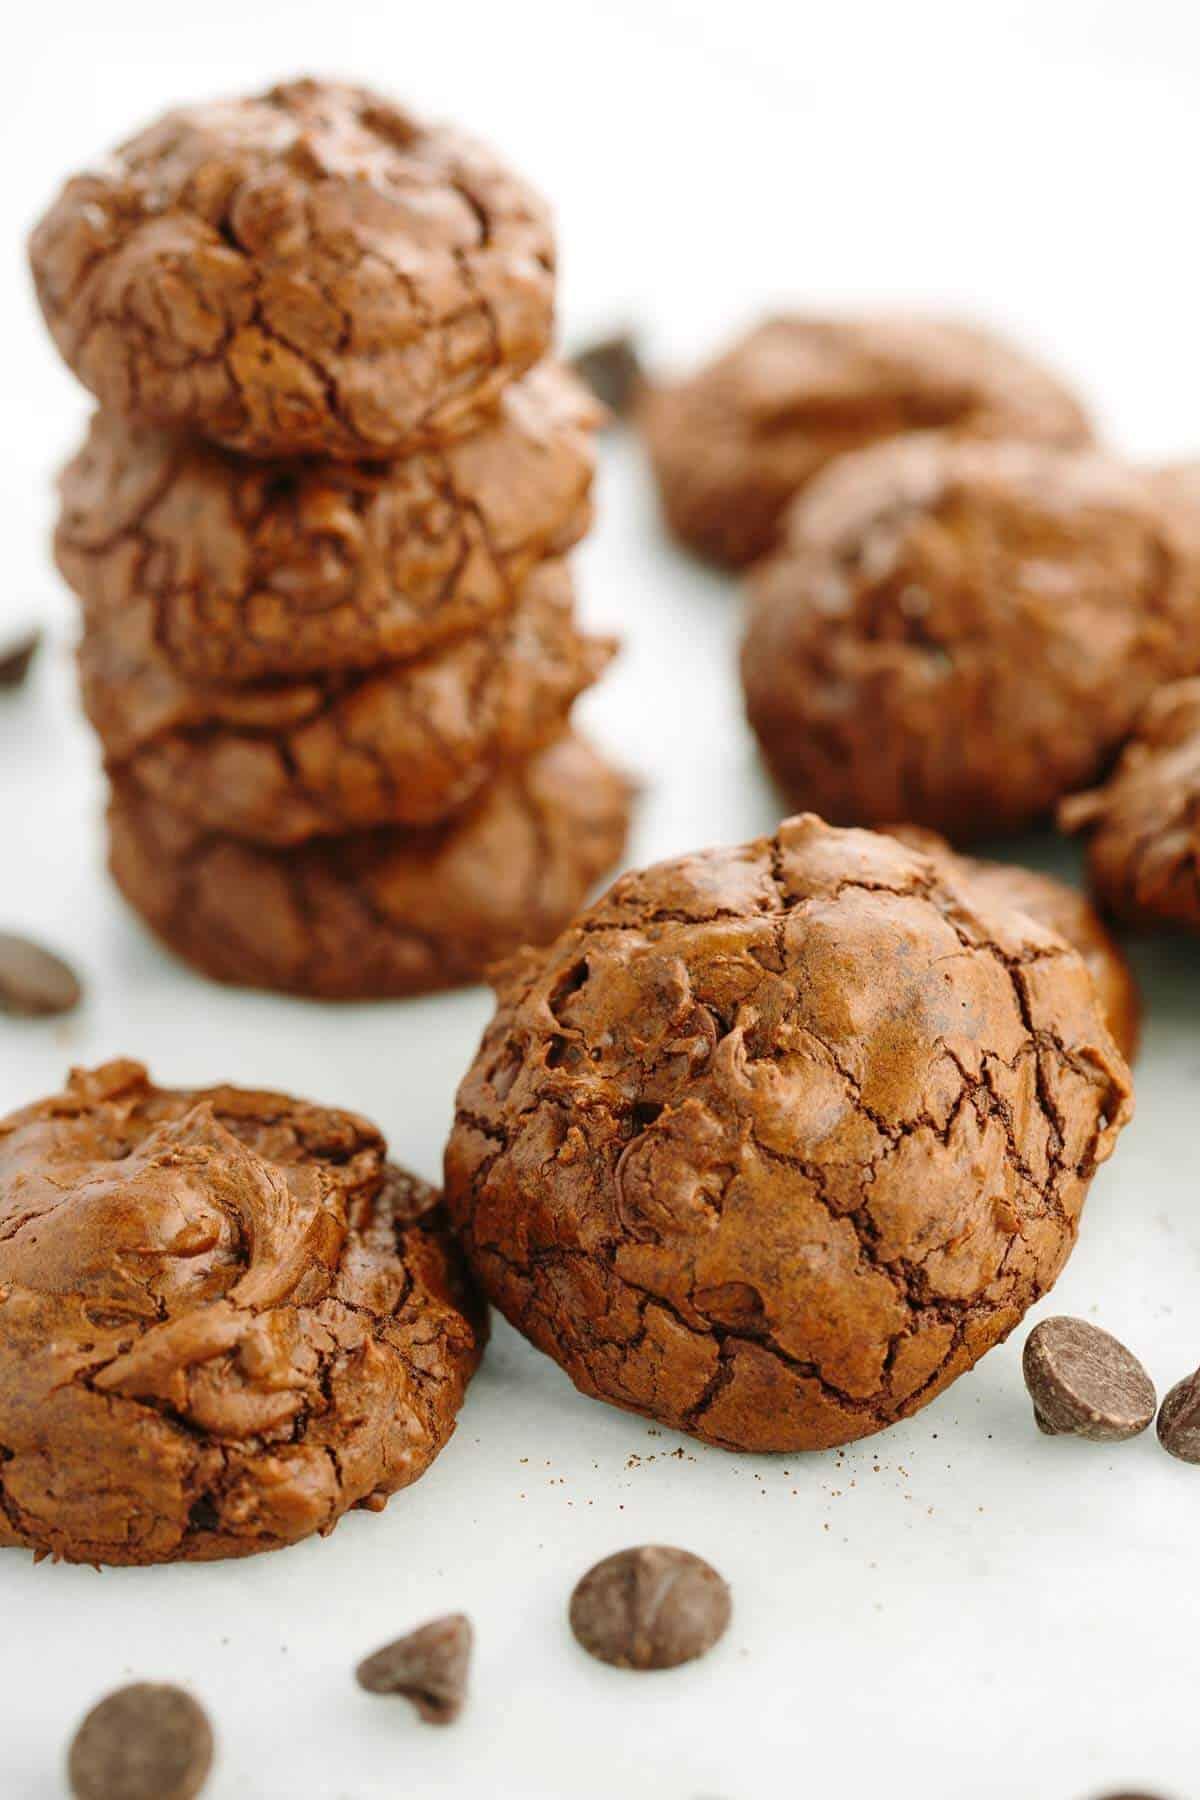 homemade-recipe-for-triple-chocolate-truffle-cookies